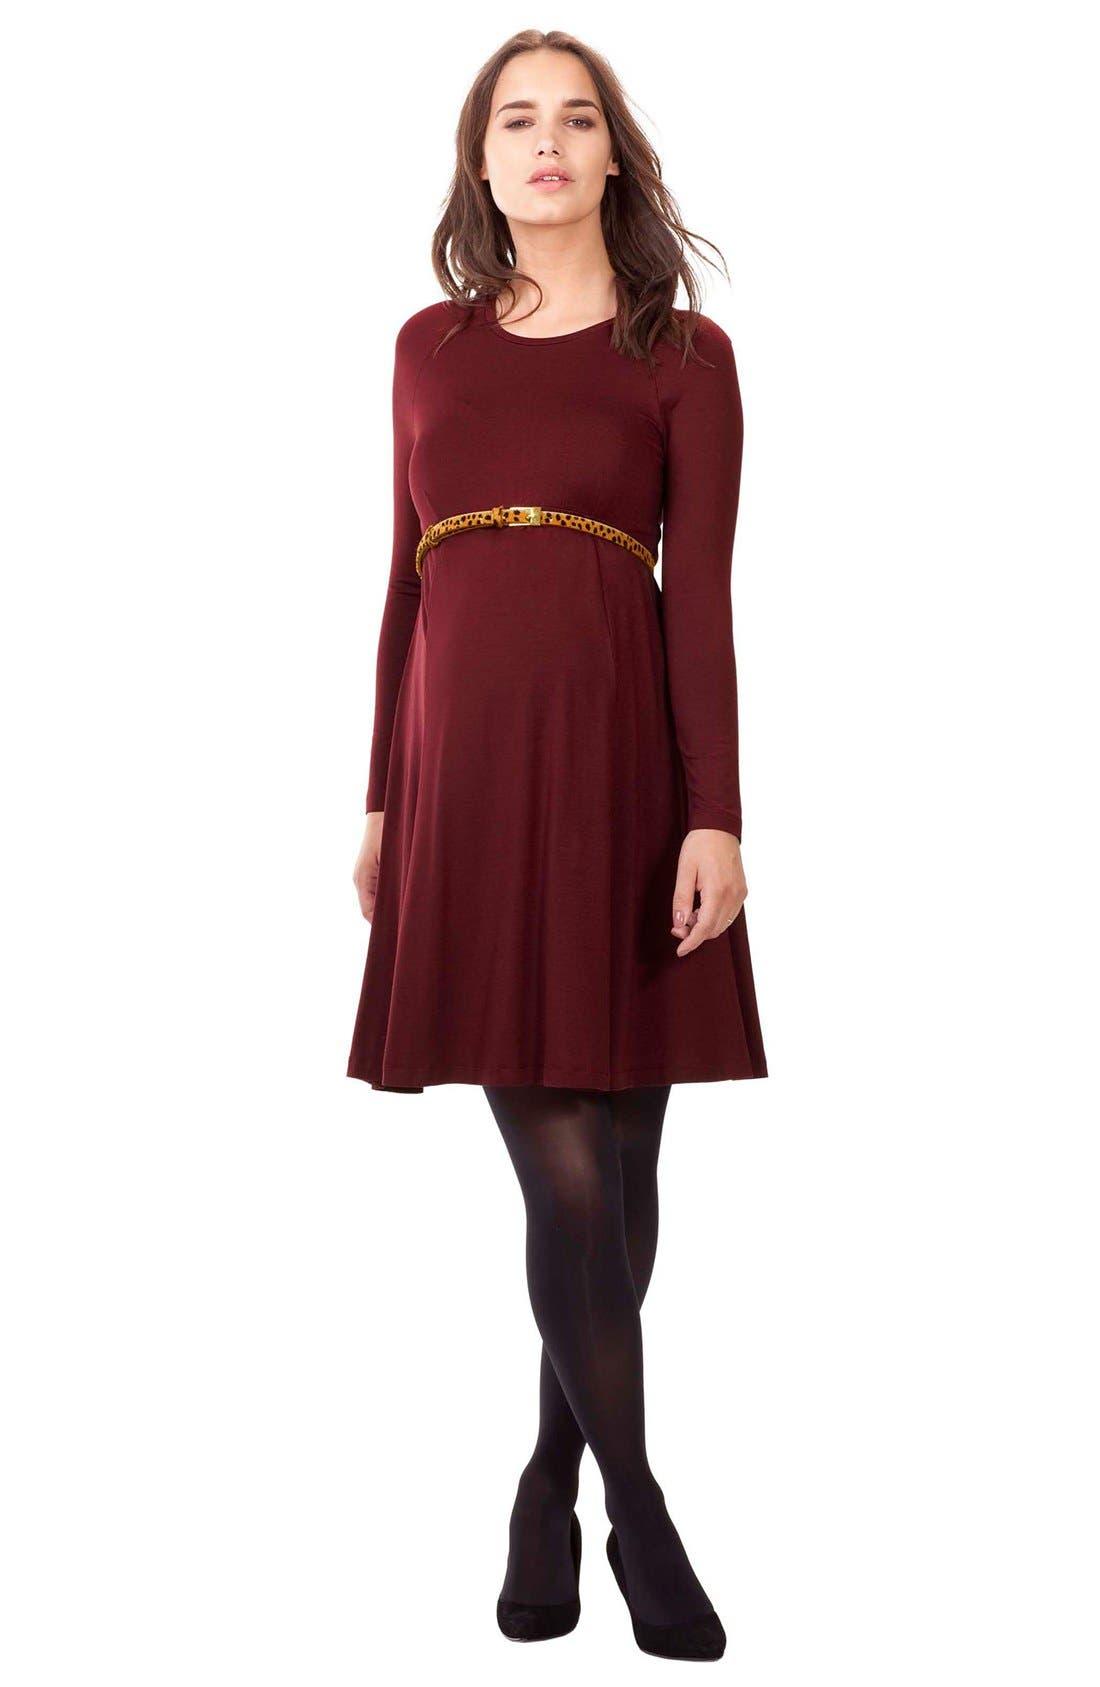 Main Image - Isabella Oliver 'Danbury' Belted Maternity Skater Dress